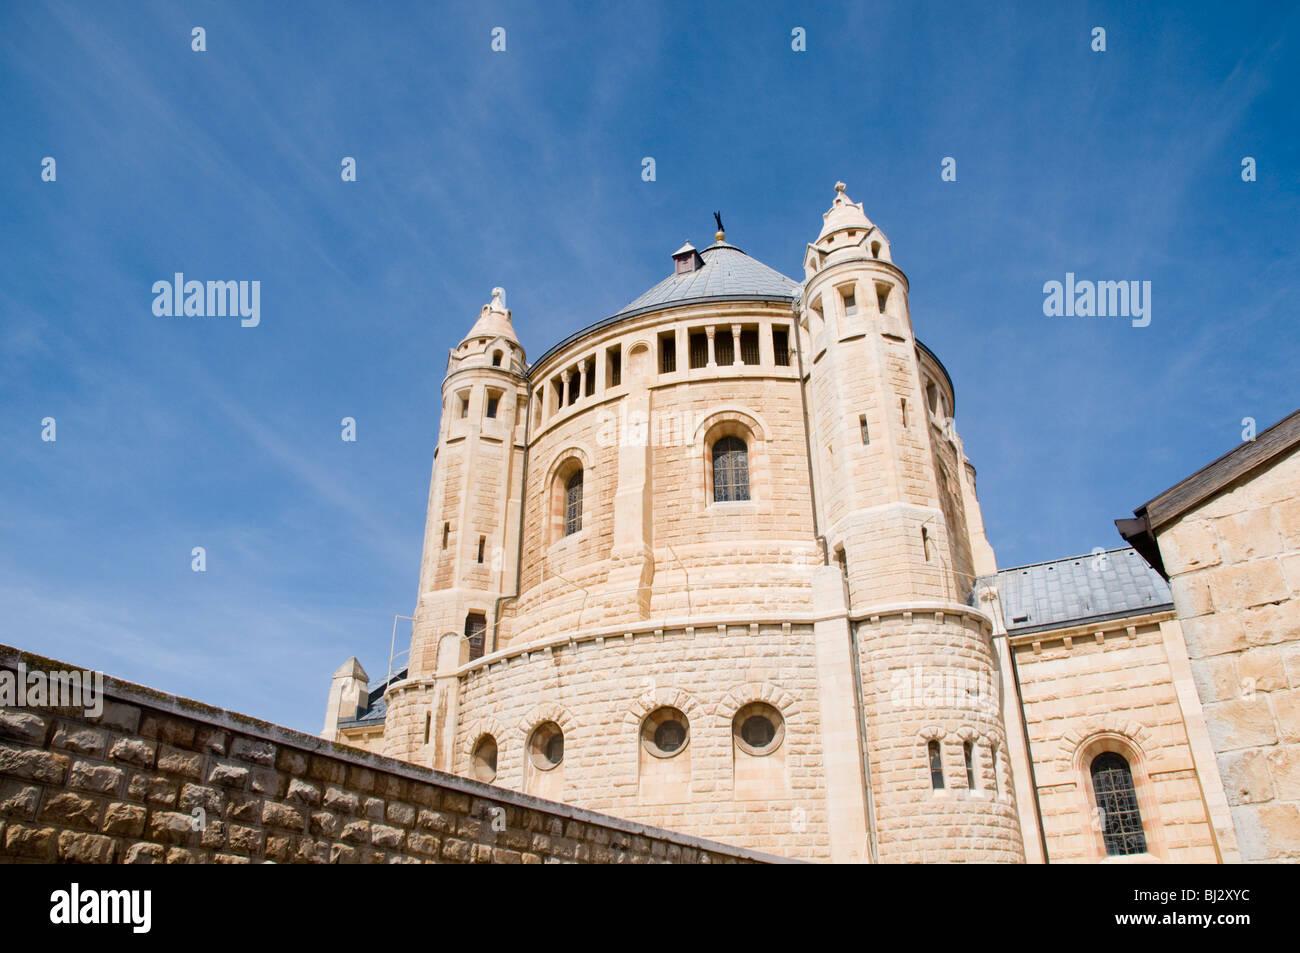 Israel, Jerusalem, Hagia Maria Sion Abbey (Dormition Abbey) - Stock Image